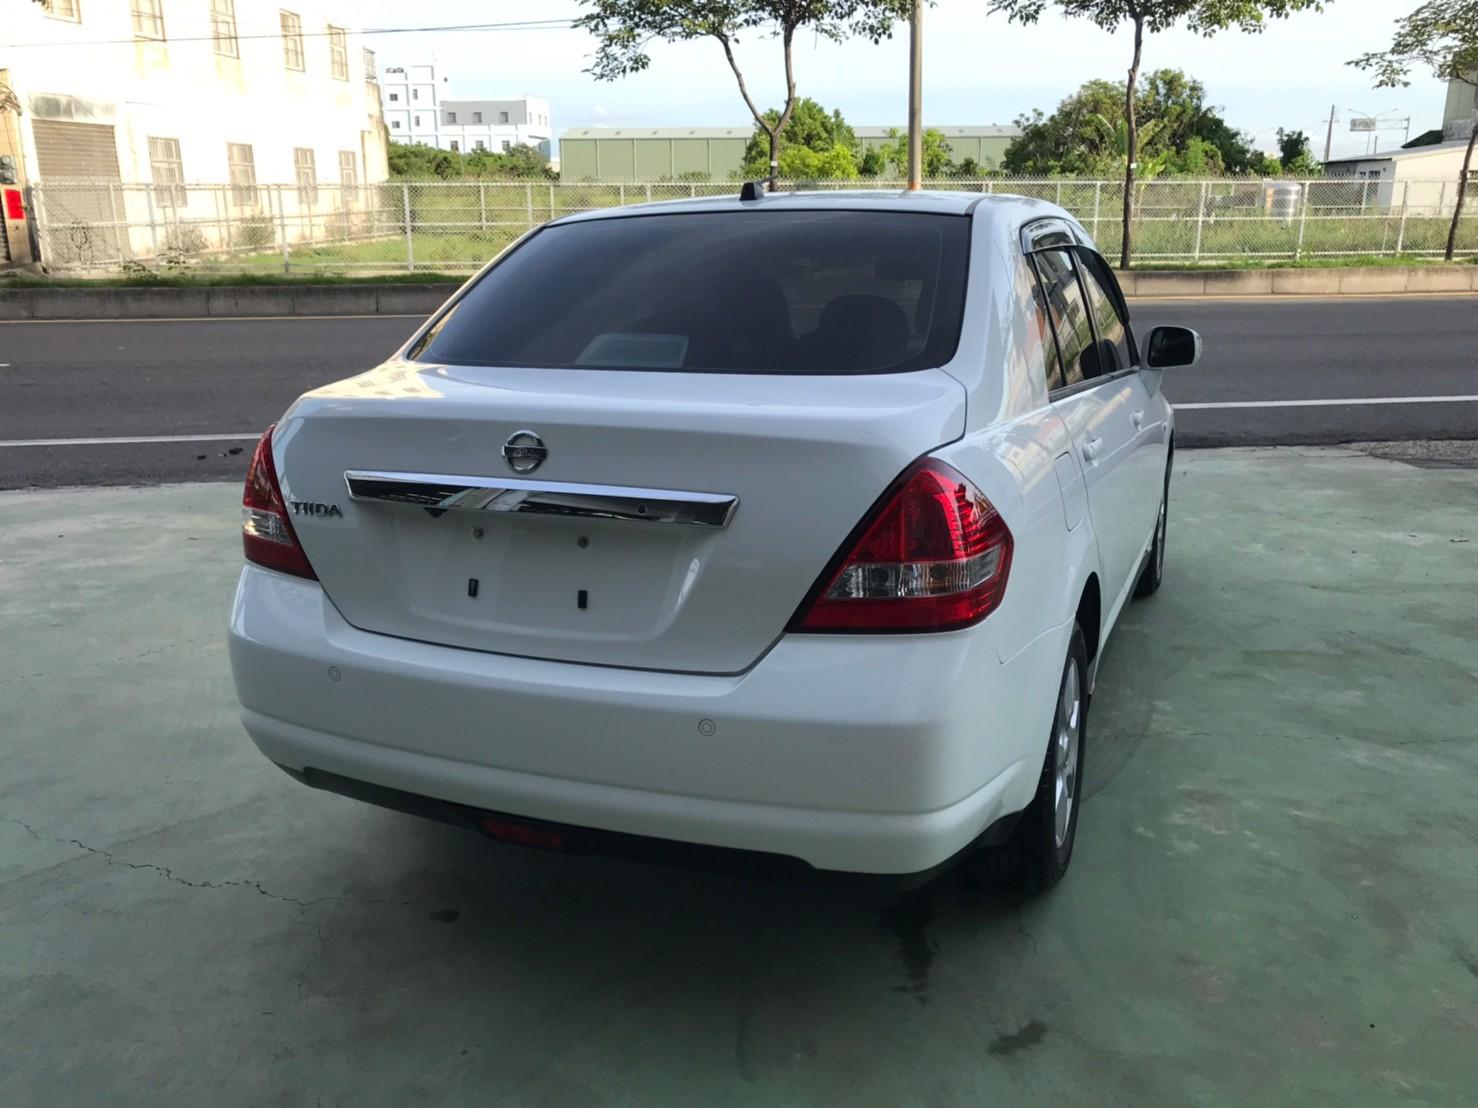 2017TIIDA 4D 里程保證 認證車 白色黑內裝 代步上課通勤好停車 SUM29.8 1.6c_210615_2